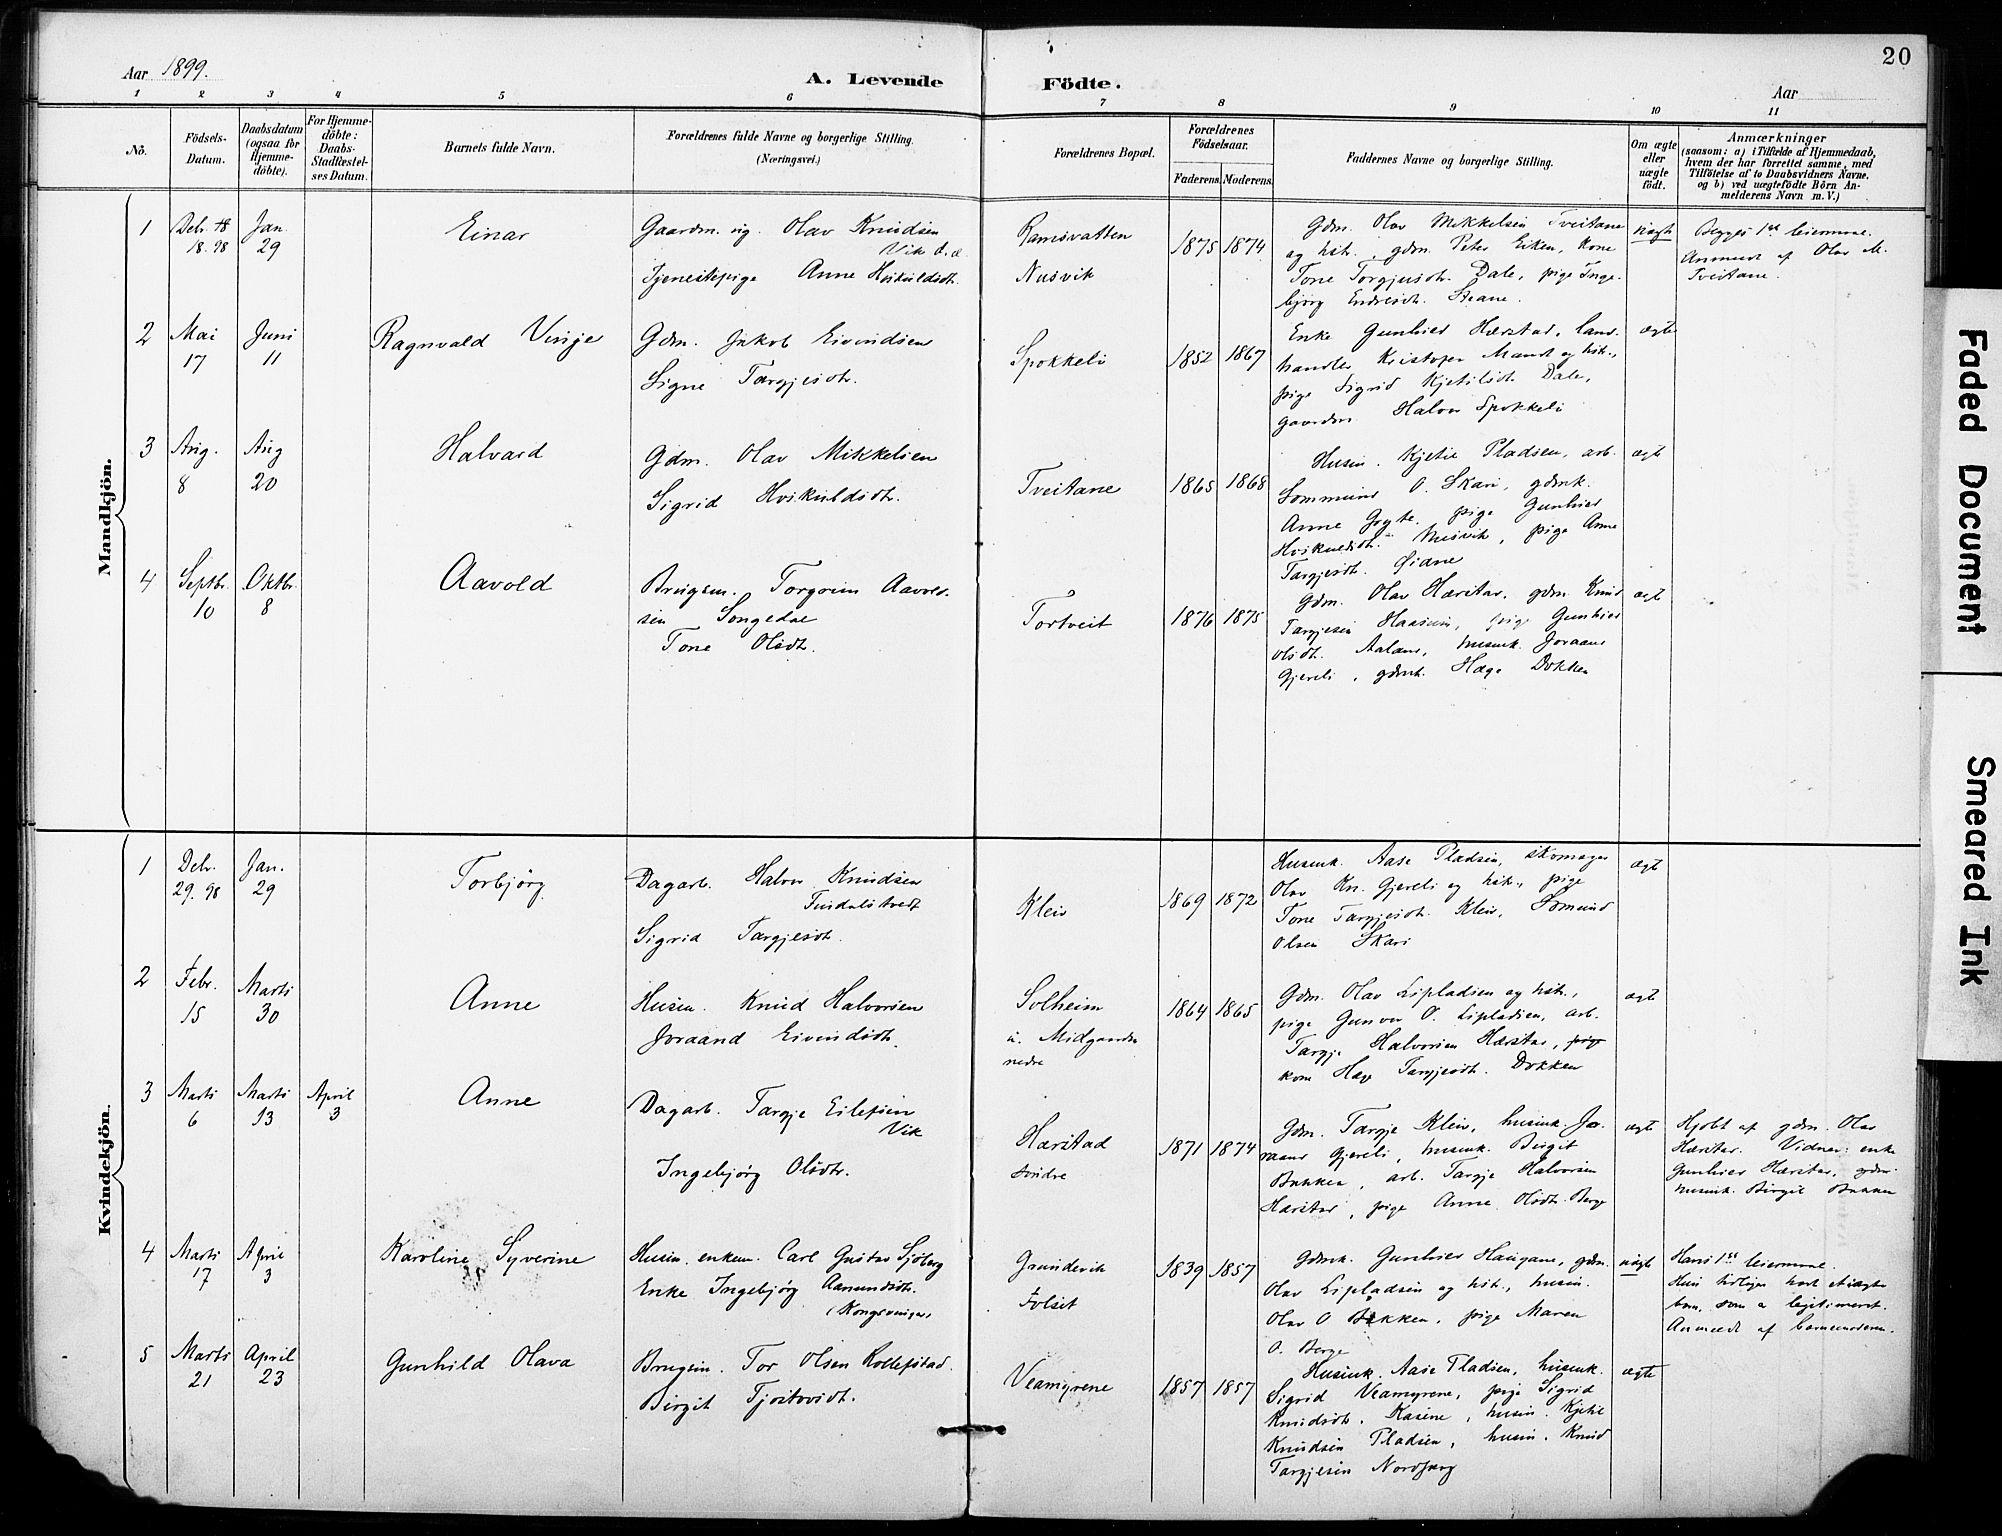 SAKO, Fyresdal kirkebøker, F/Fb/L0003: Ministerialbok nr. II 3, 1887-1903, s. 20